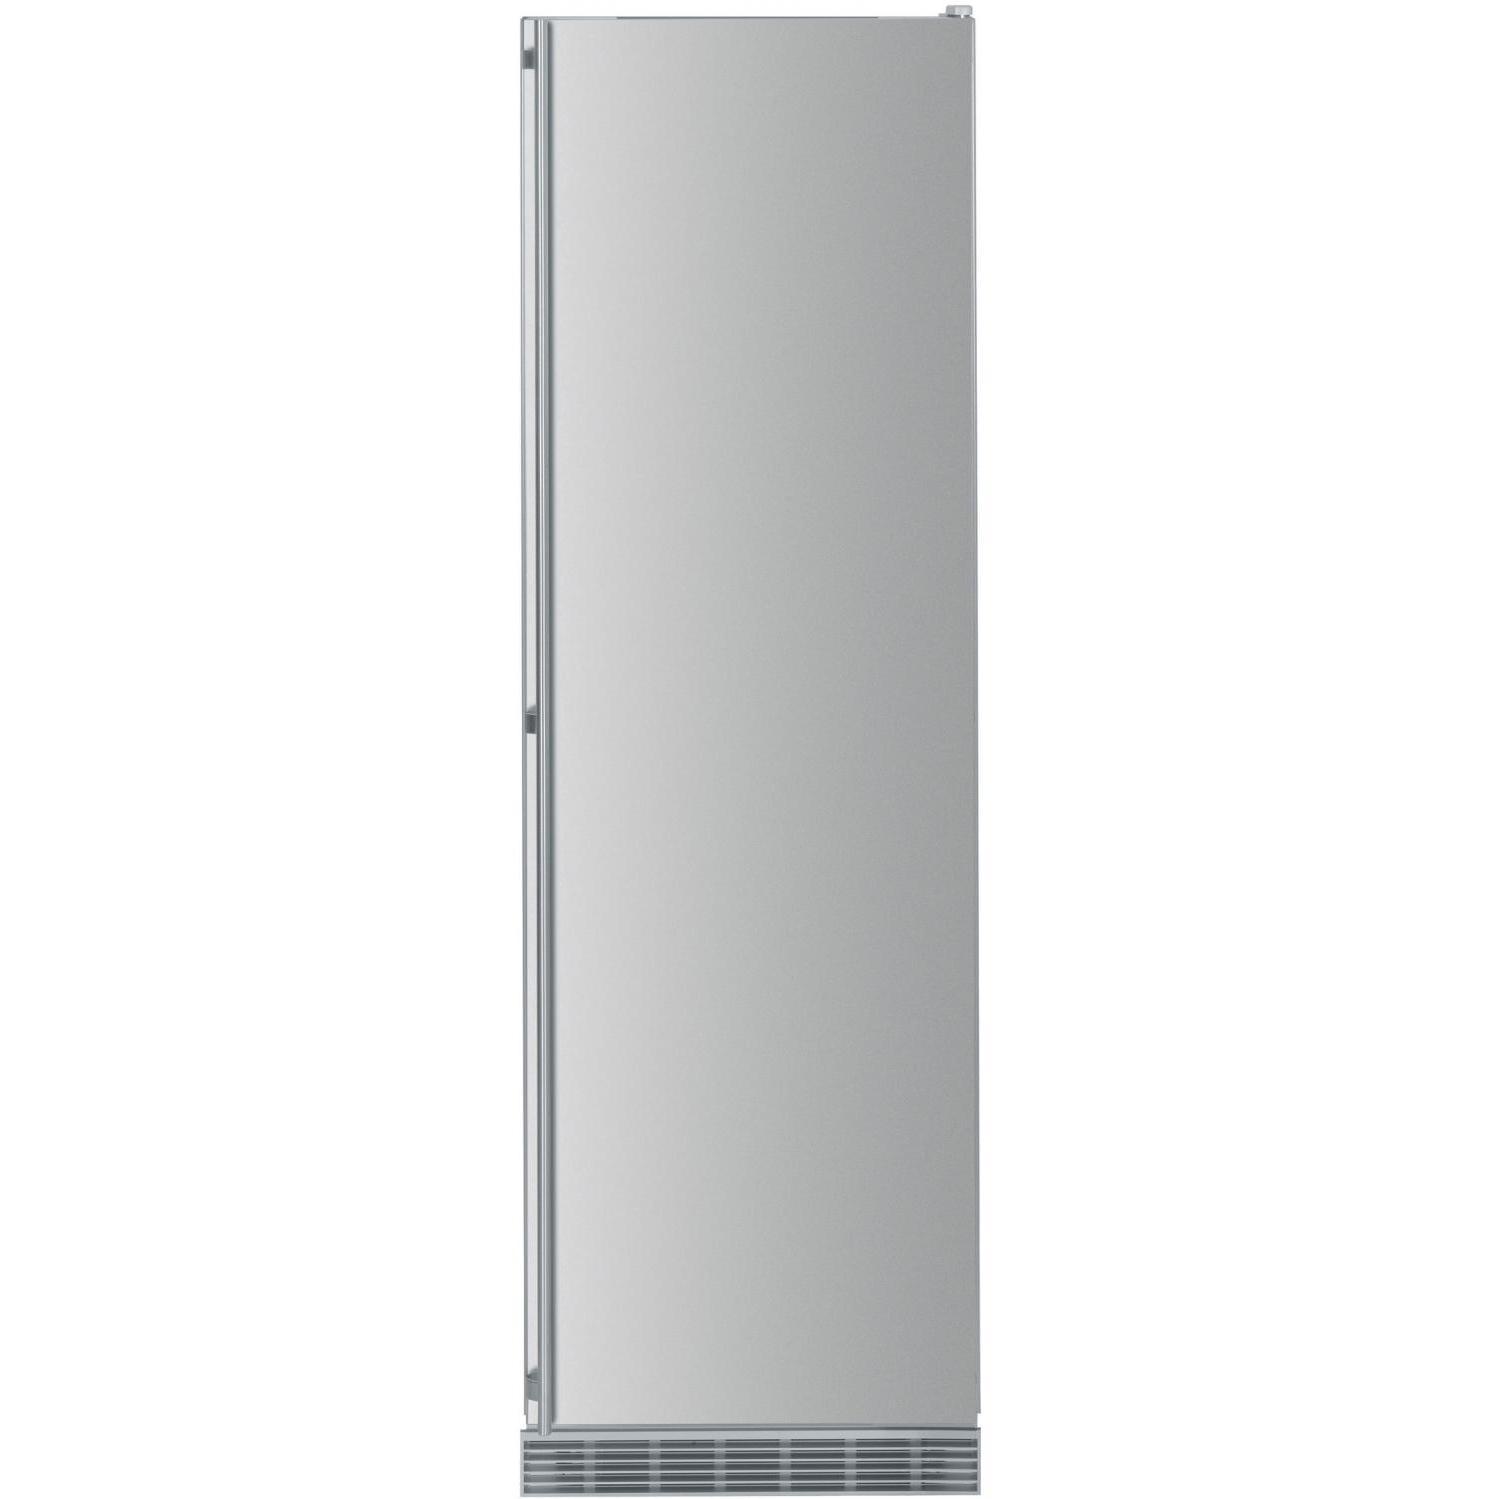 Liebherr R-1410 13.5 Cu. Ft. Capacity Built-In Refrigerator - Stainless Steel